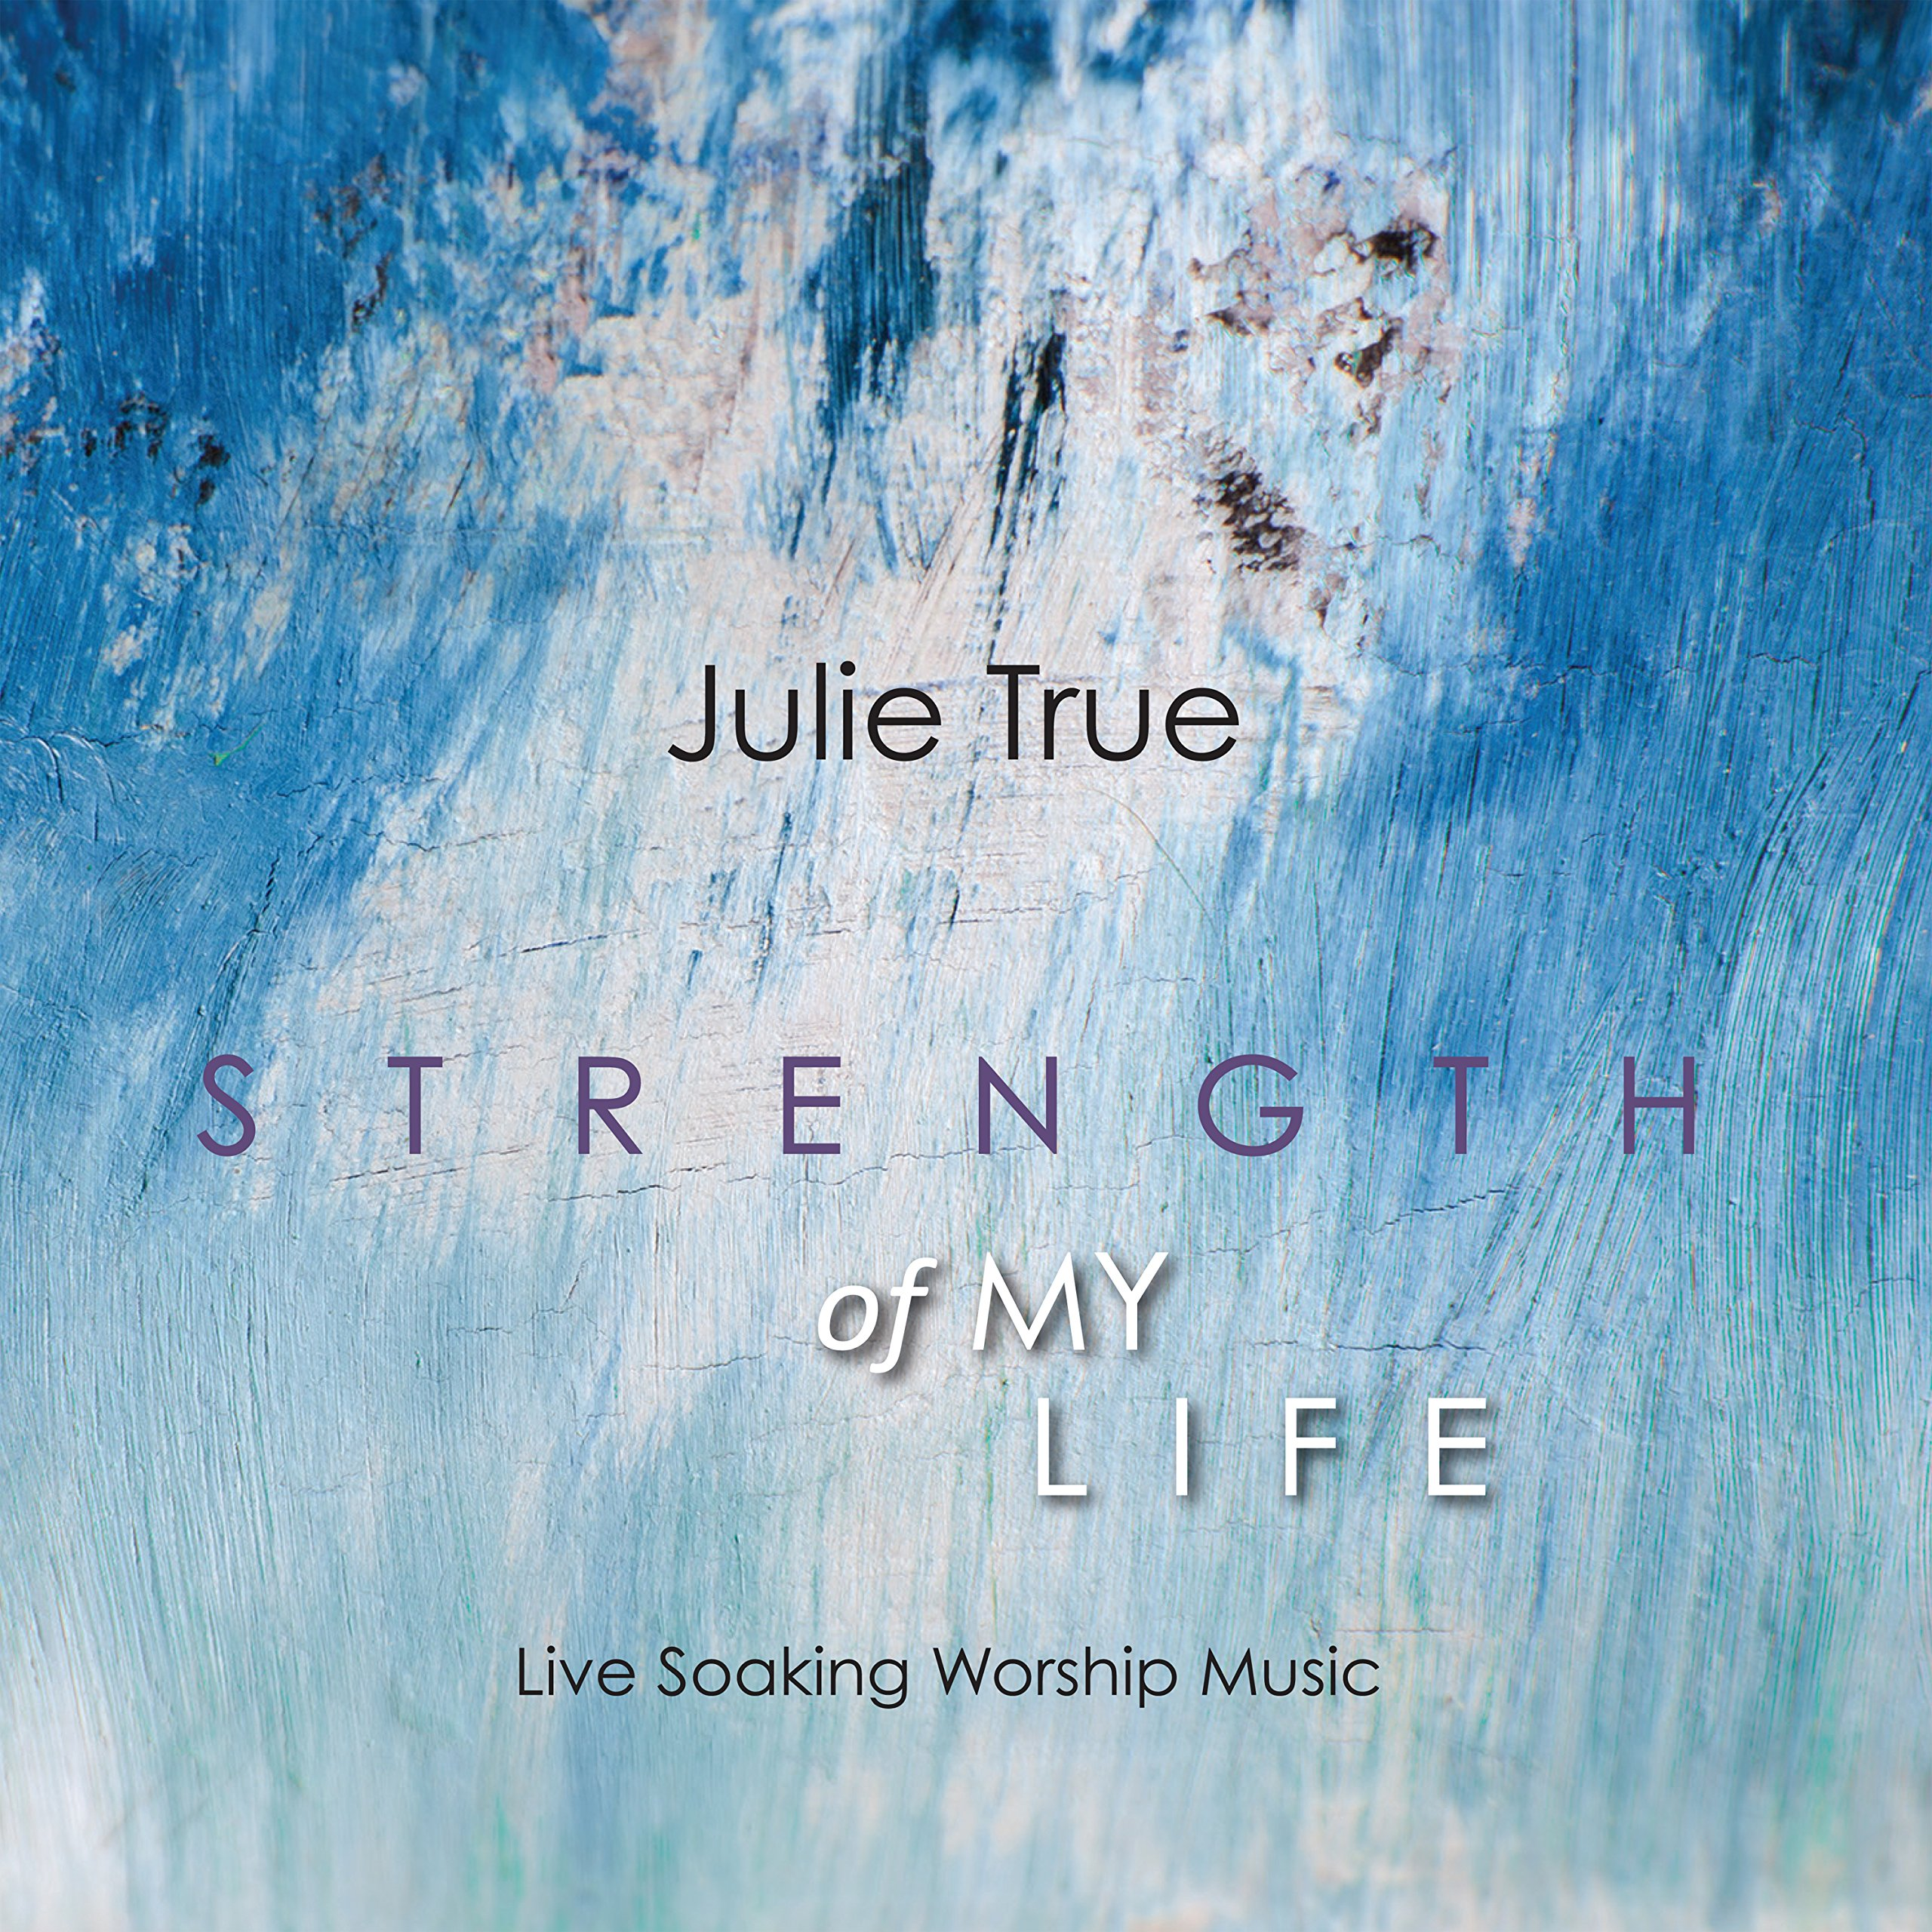 Strength of My Life - Live Soaking Worship Music